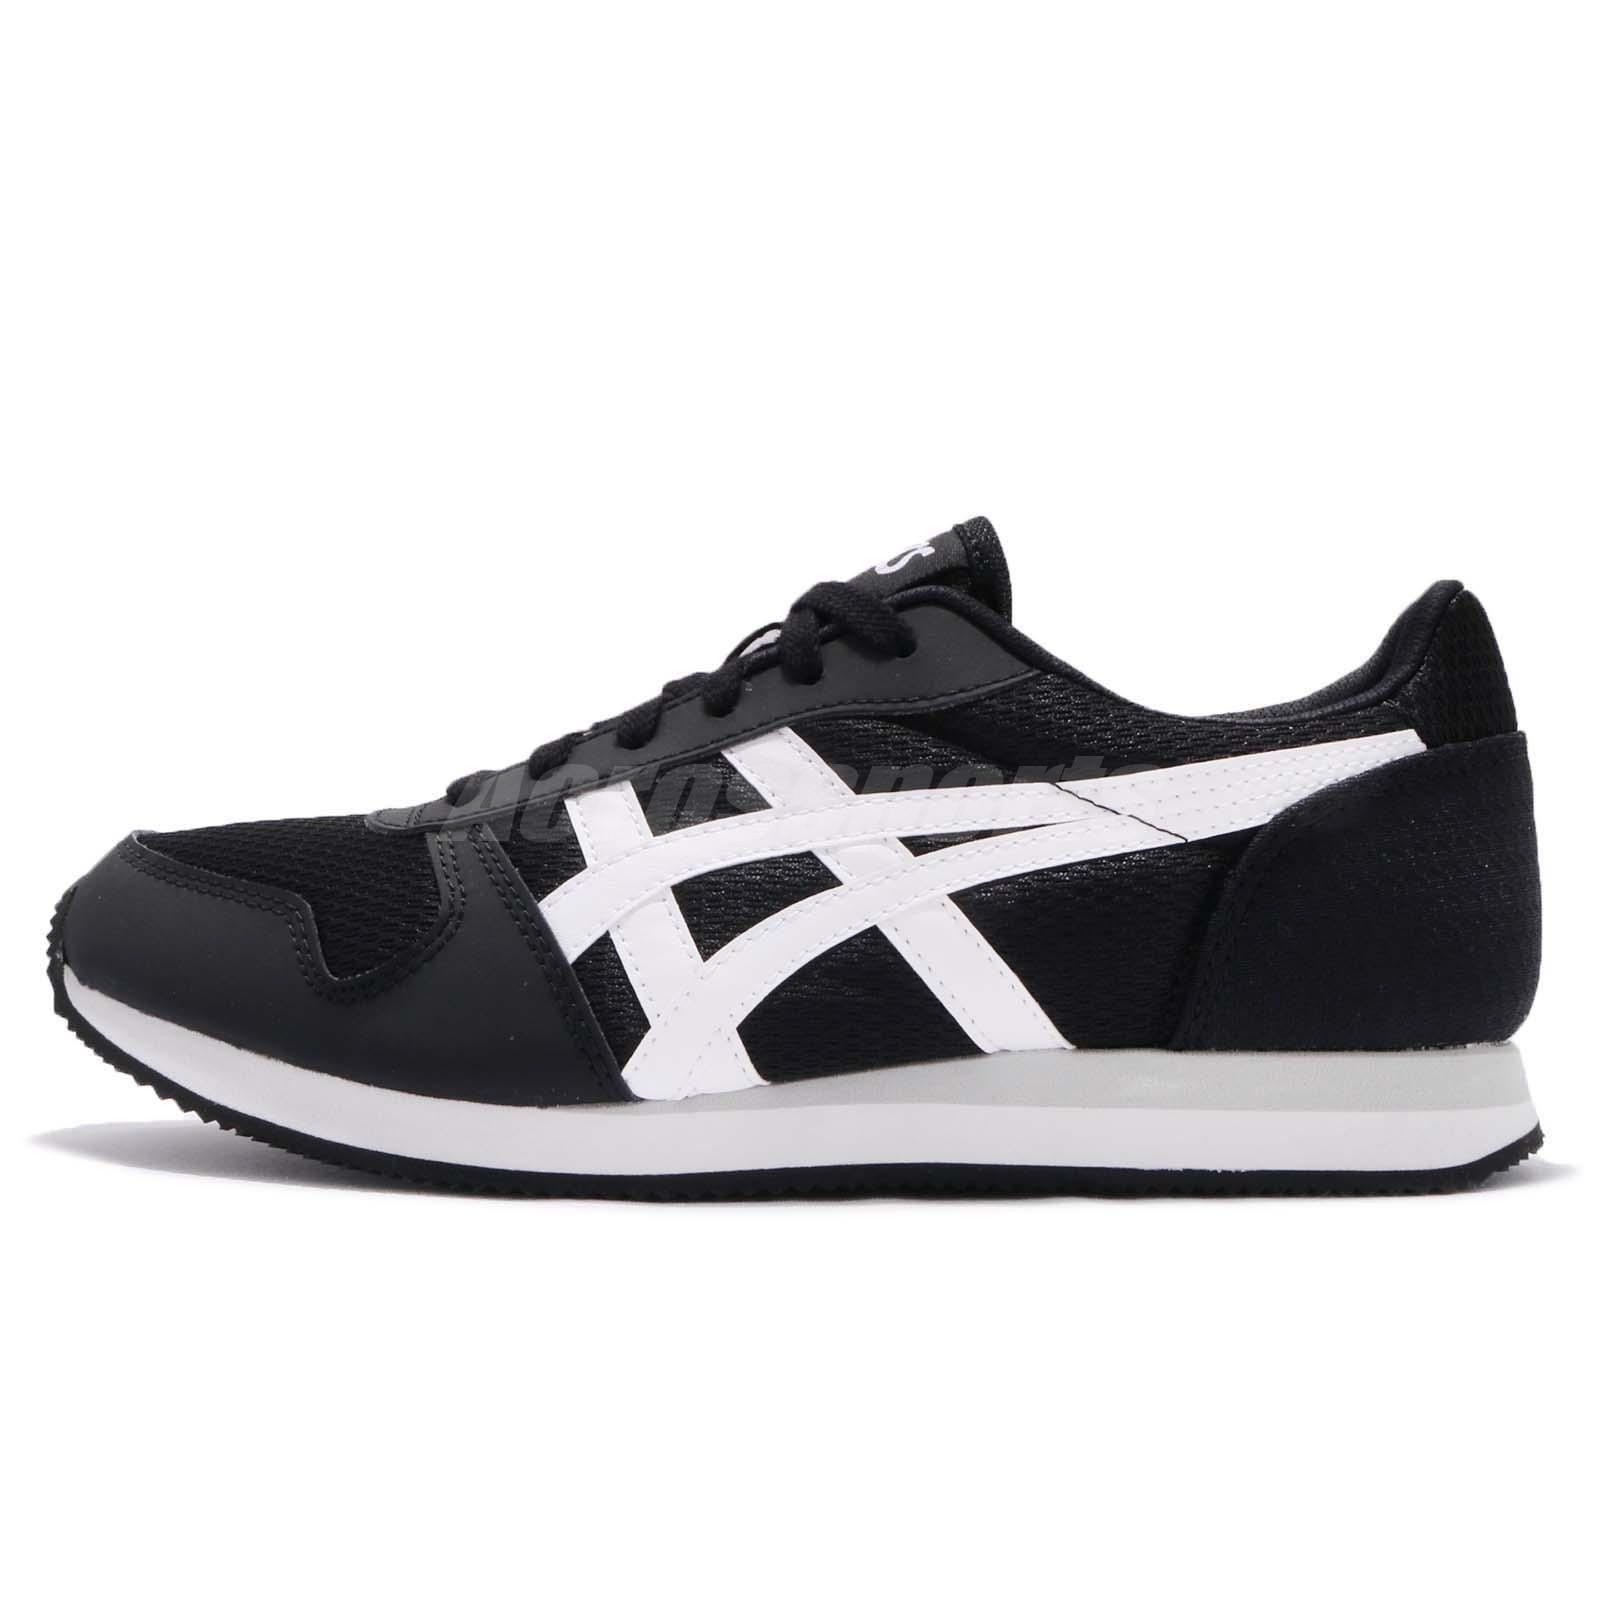 Sneakers ASICS TIGER Curreo II HN7A0 BlackWhite 9001